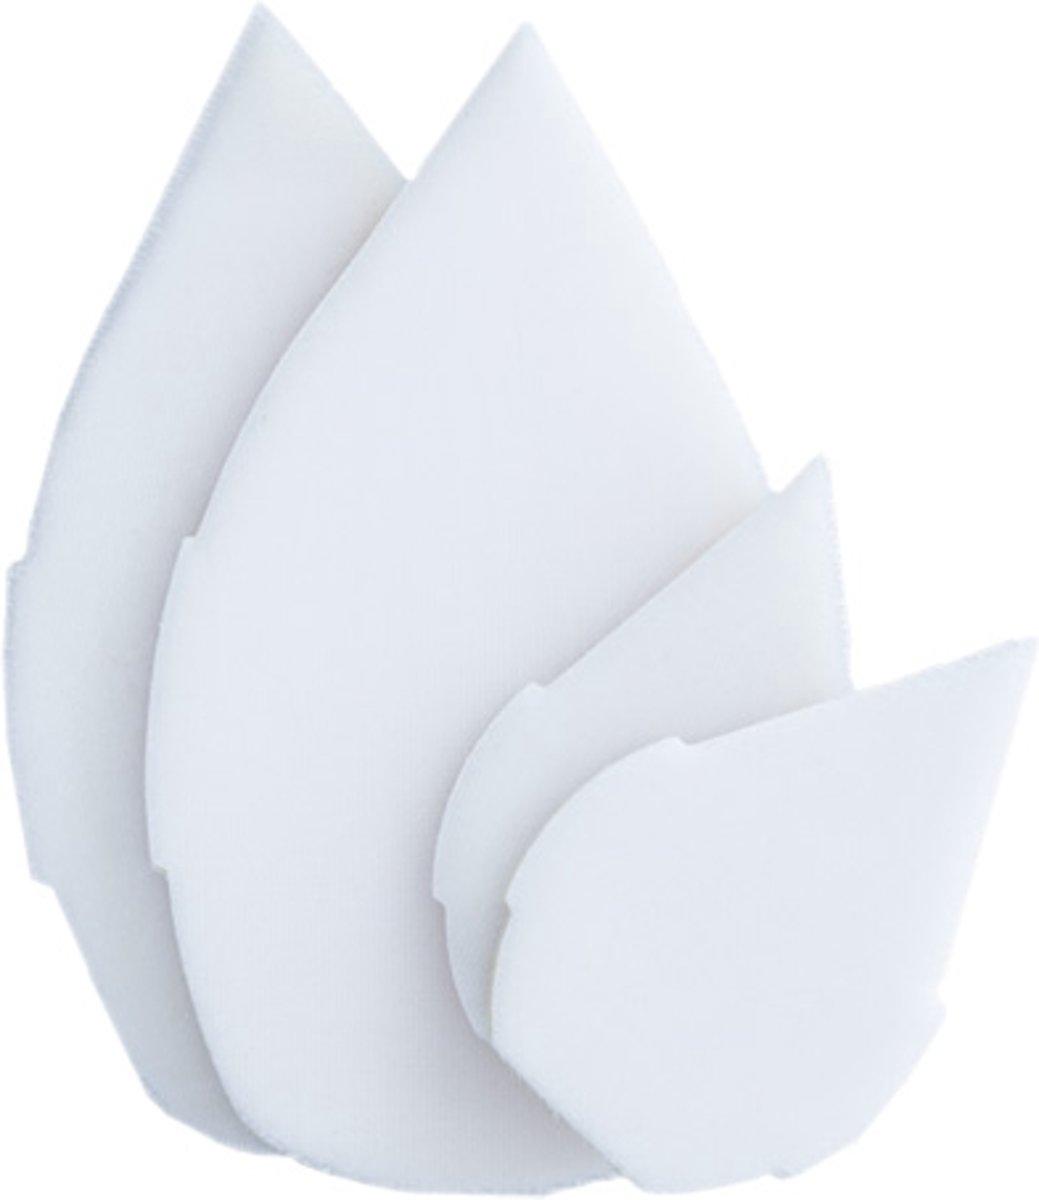 Extra pads voor Point n paint en Wall paint tool kopen